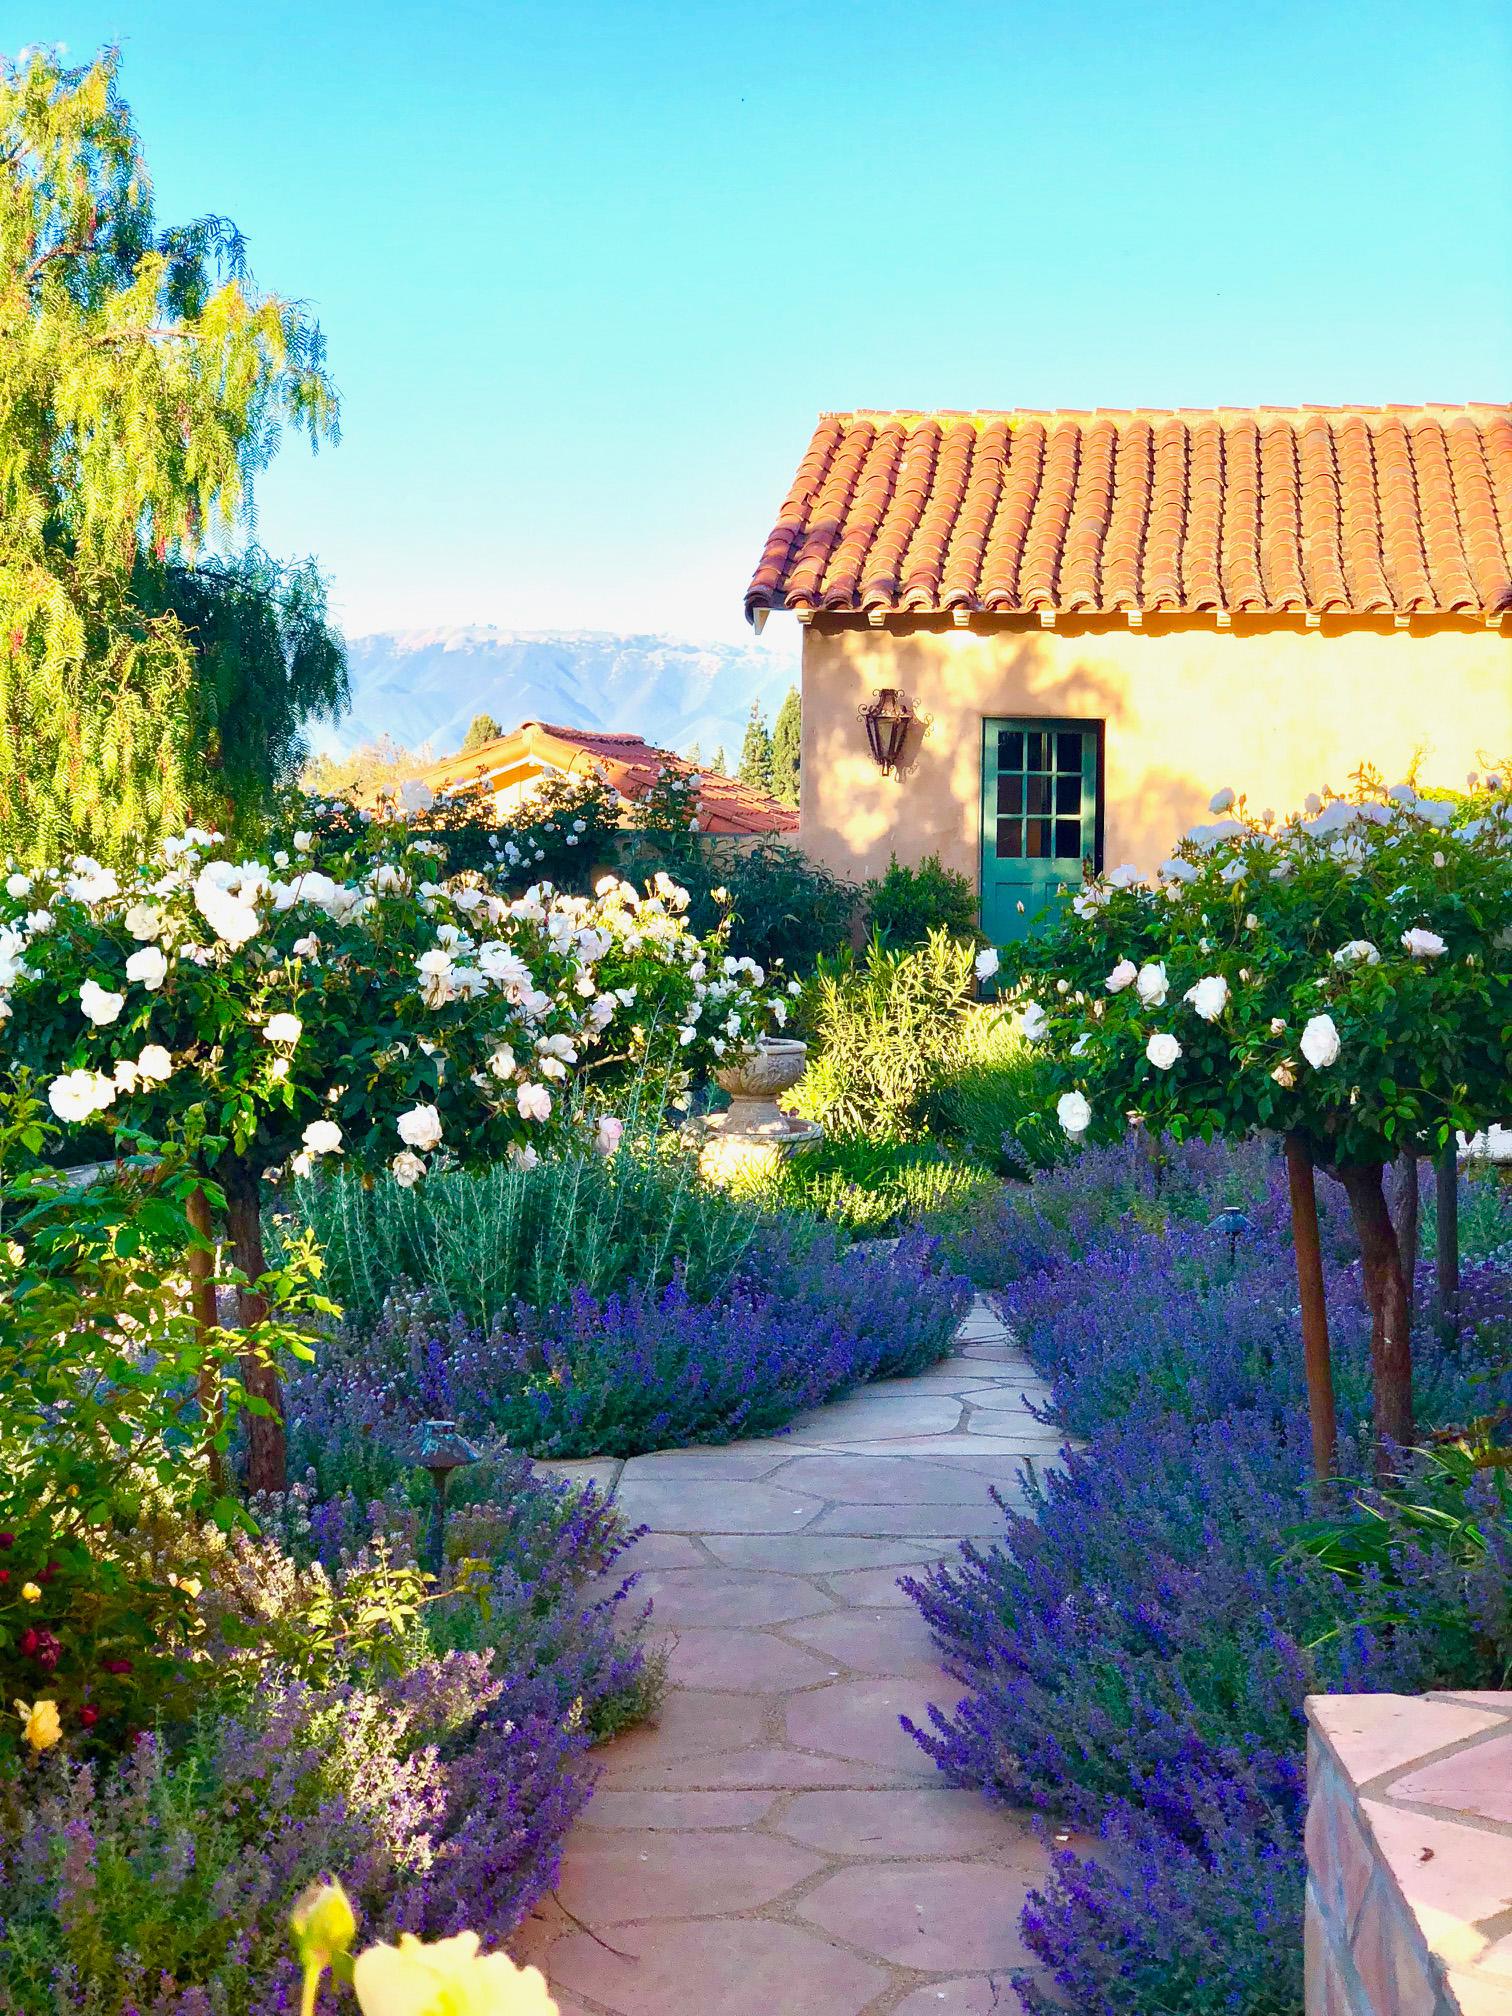 cindy hattersley's rose garden in full bloom